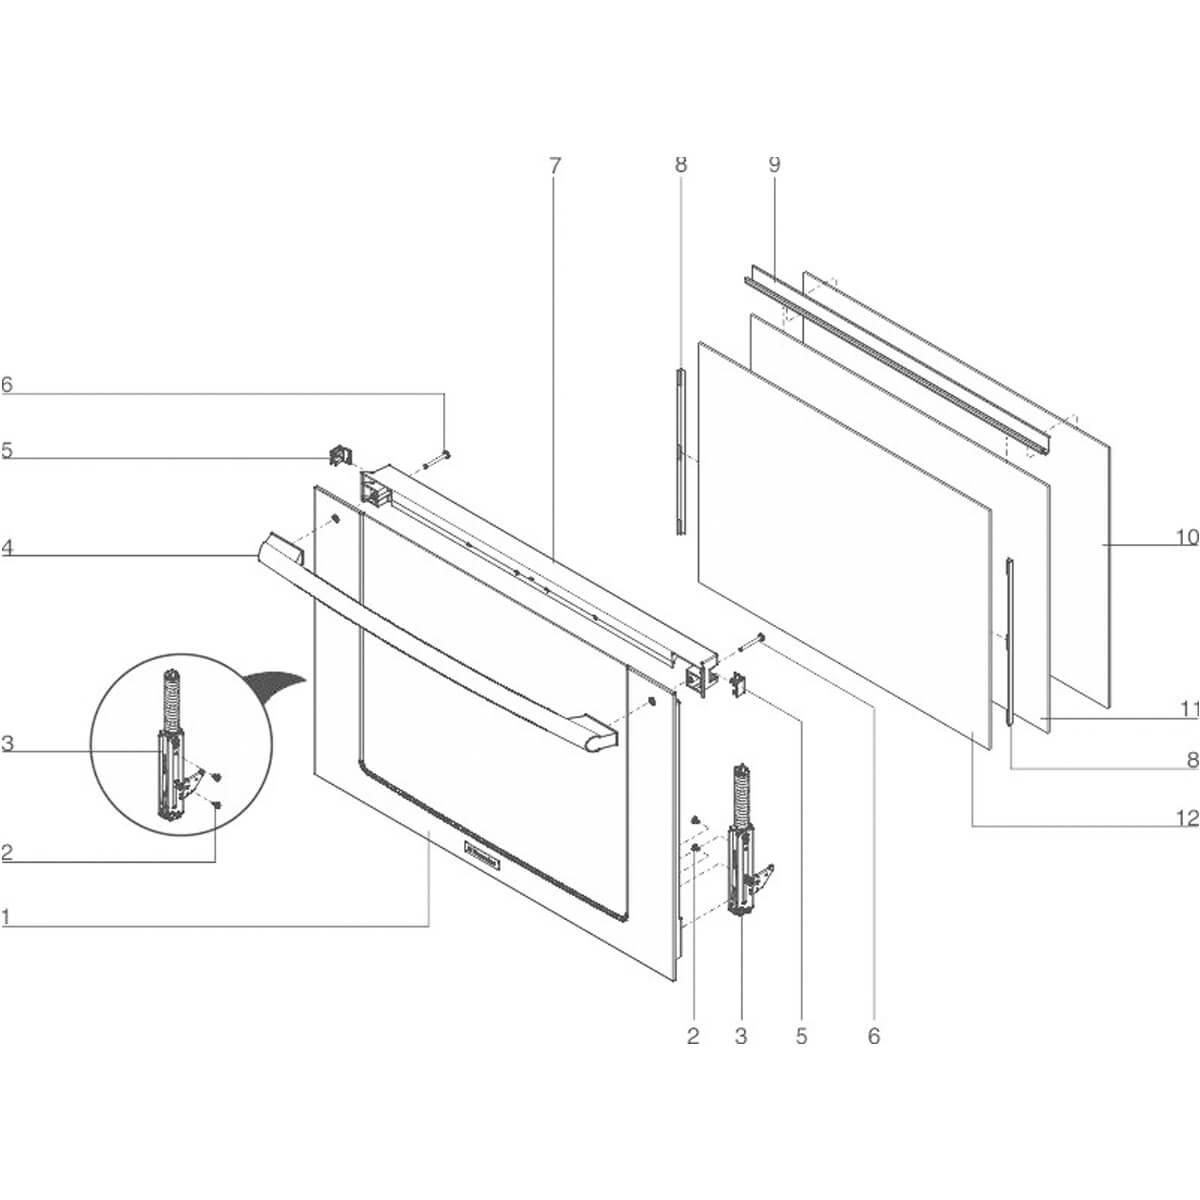 Vidro Térmico Intermediário Para Forno Elétrico Electrolux WOI76 -   139010500